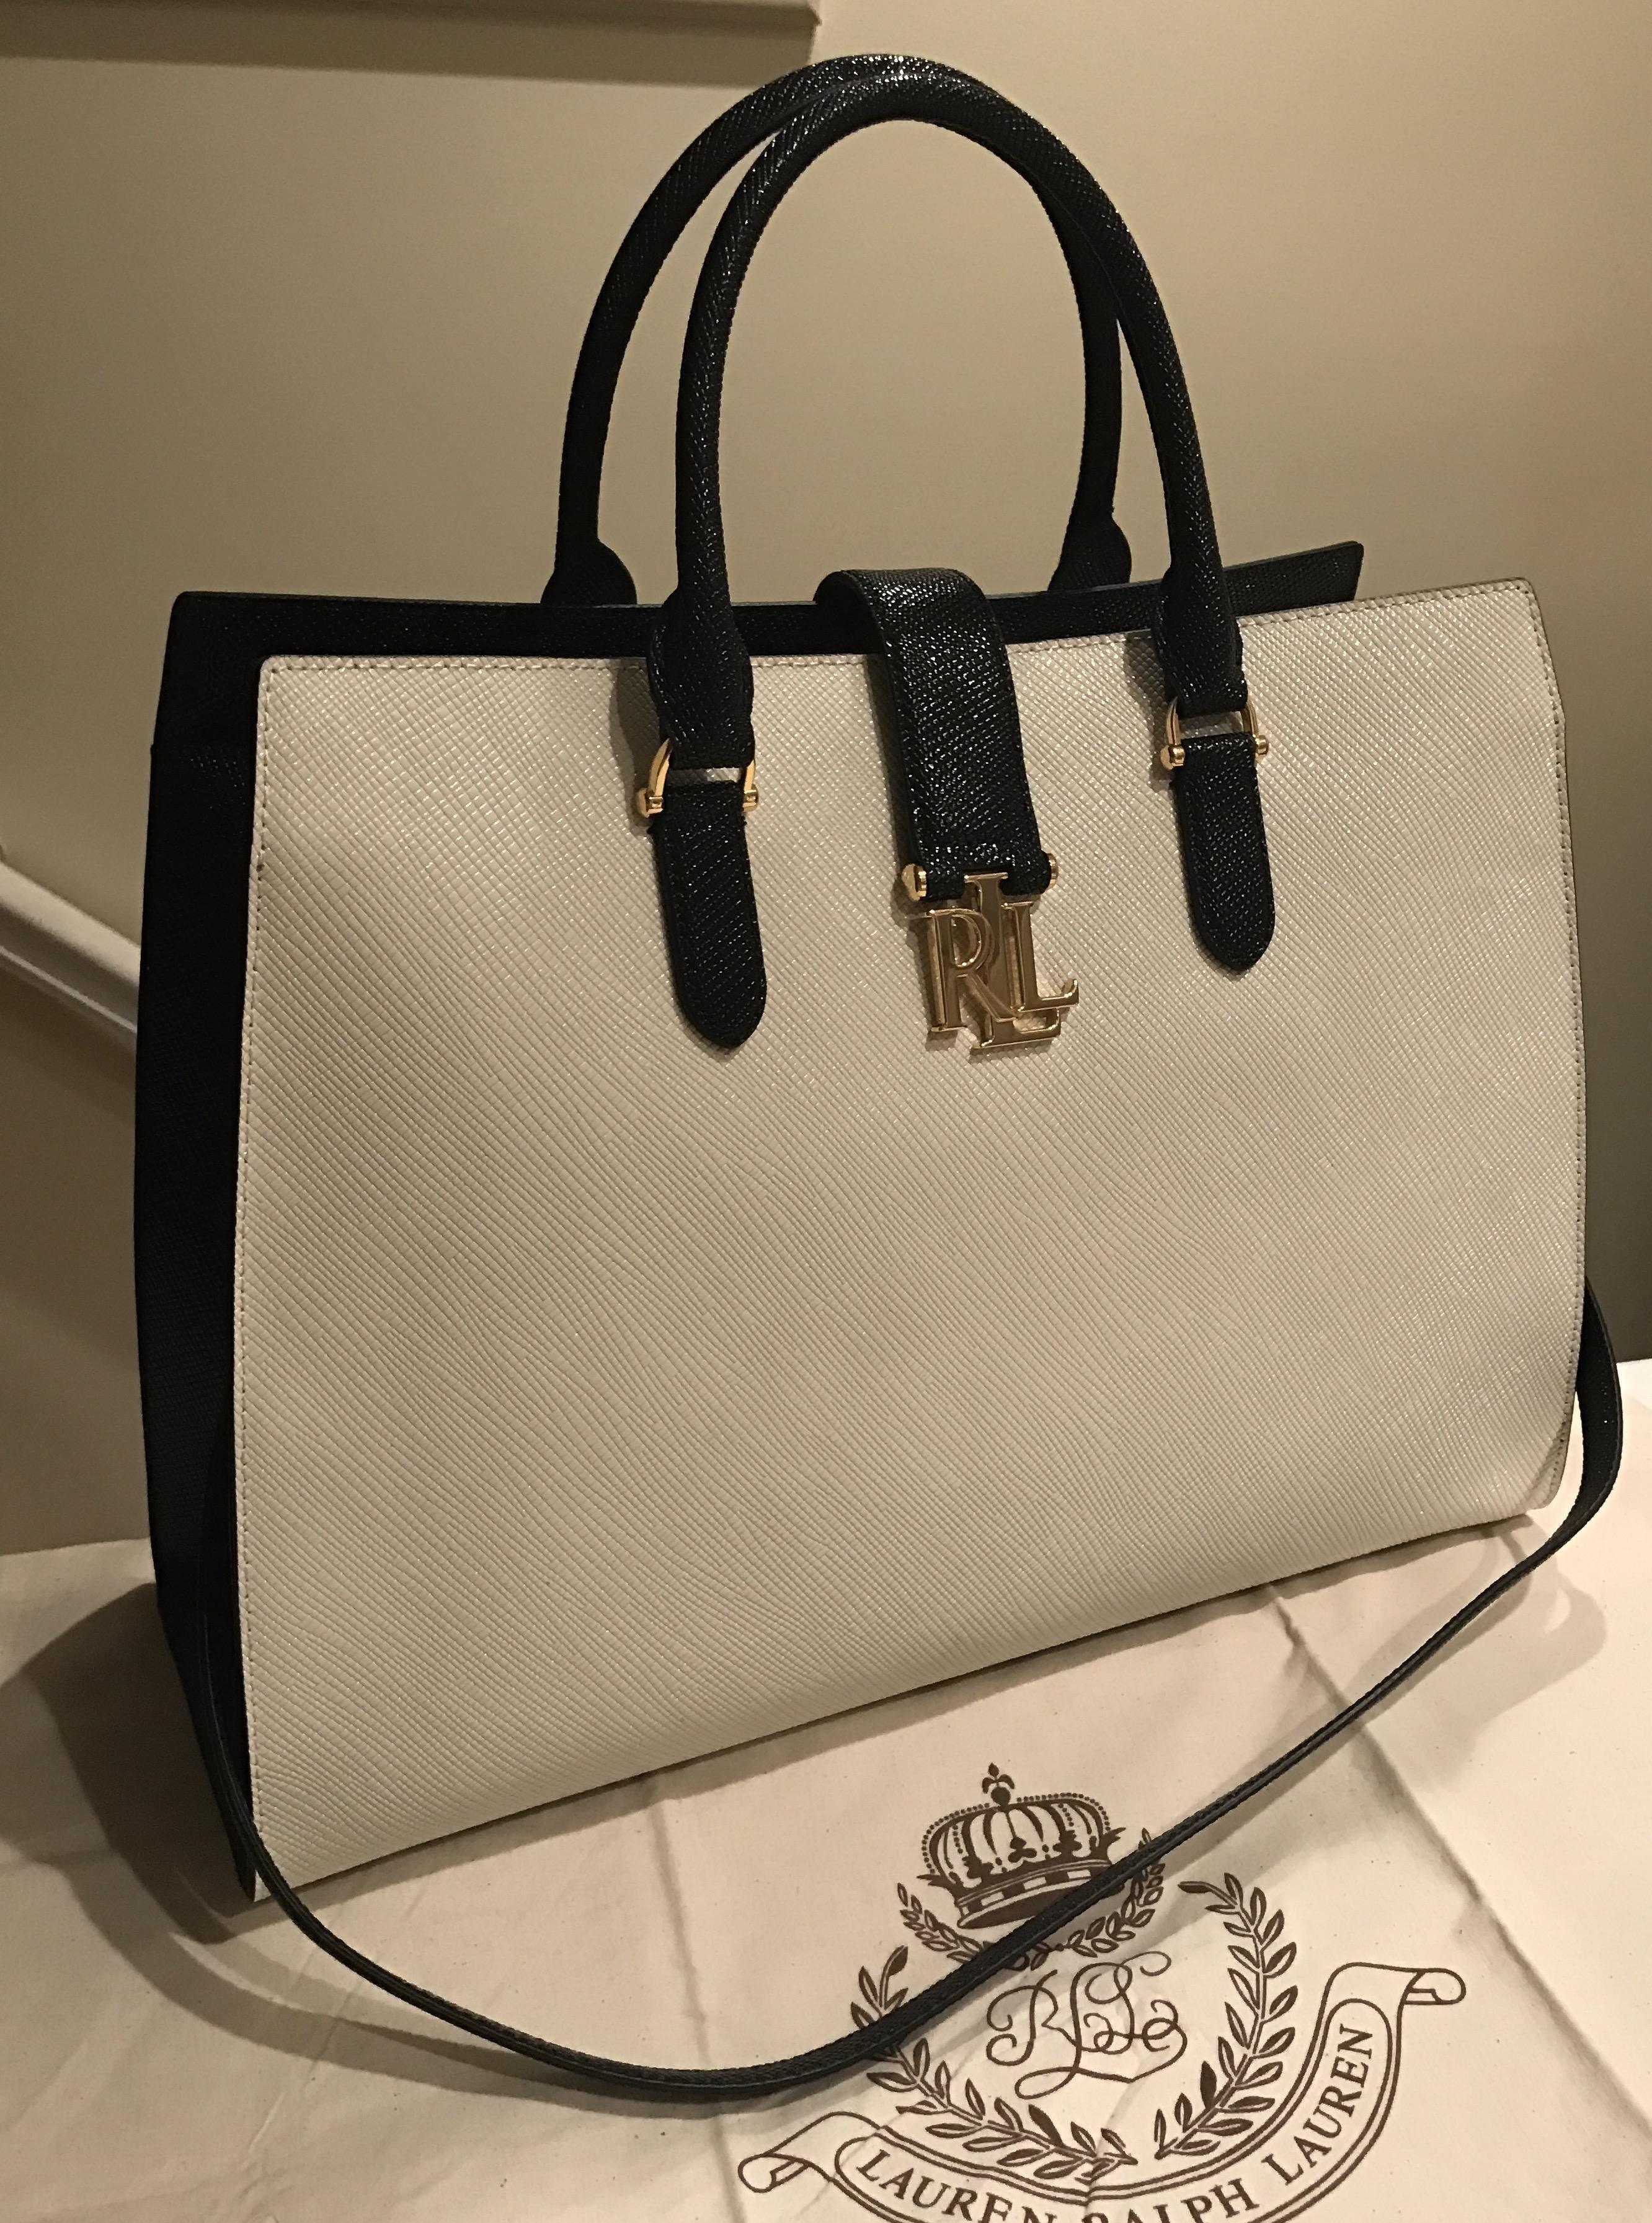 d1050aa763 Lauren Ralph Lauren Carrington Brigitte Nwt! Saffiano Leather Satchel Black    Vanilla Beige White Tote Bag. Get one of the hottest styles of the season!